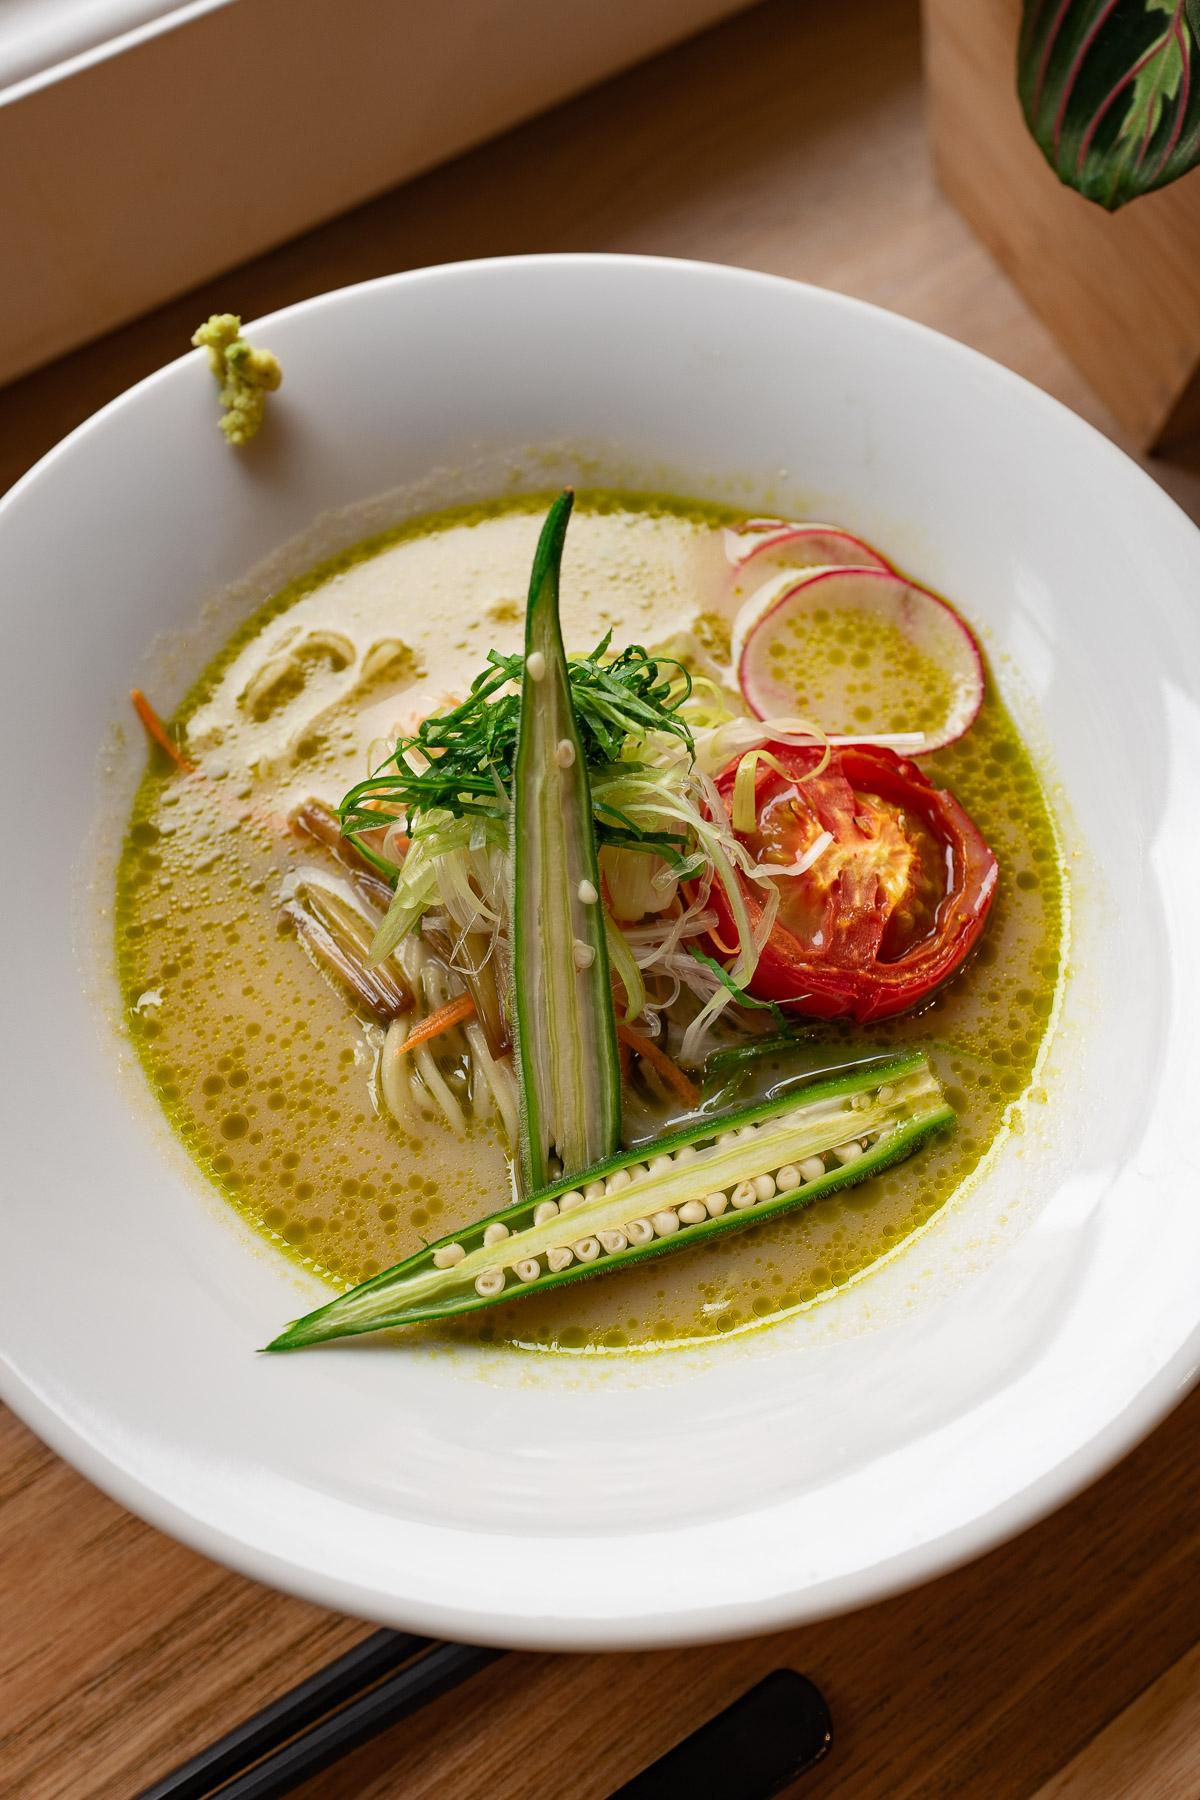 green wasabi ramen - 35 zł